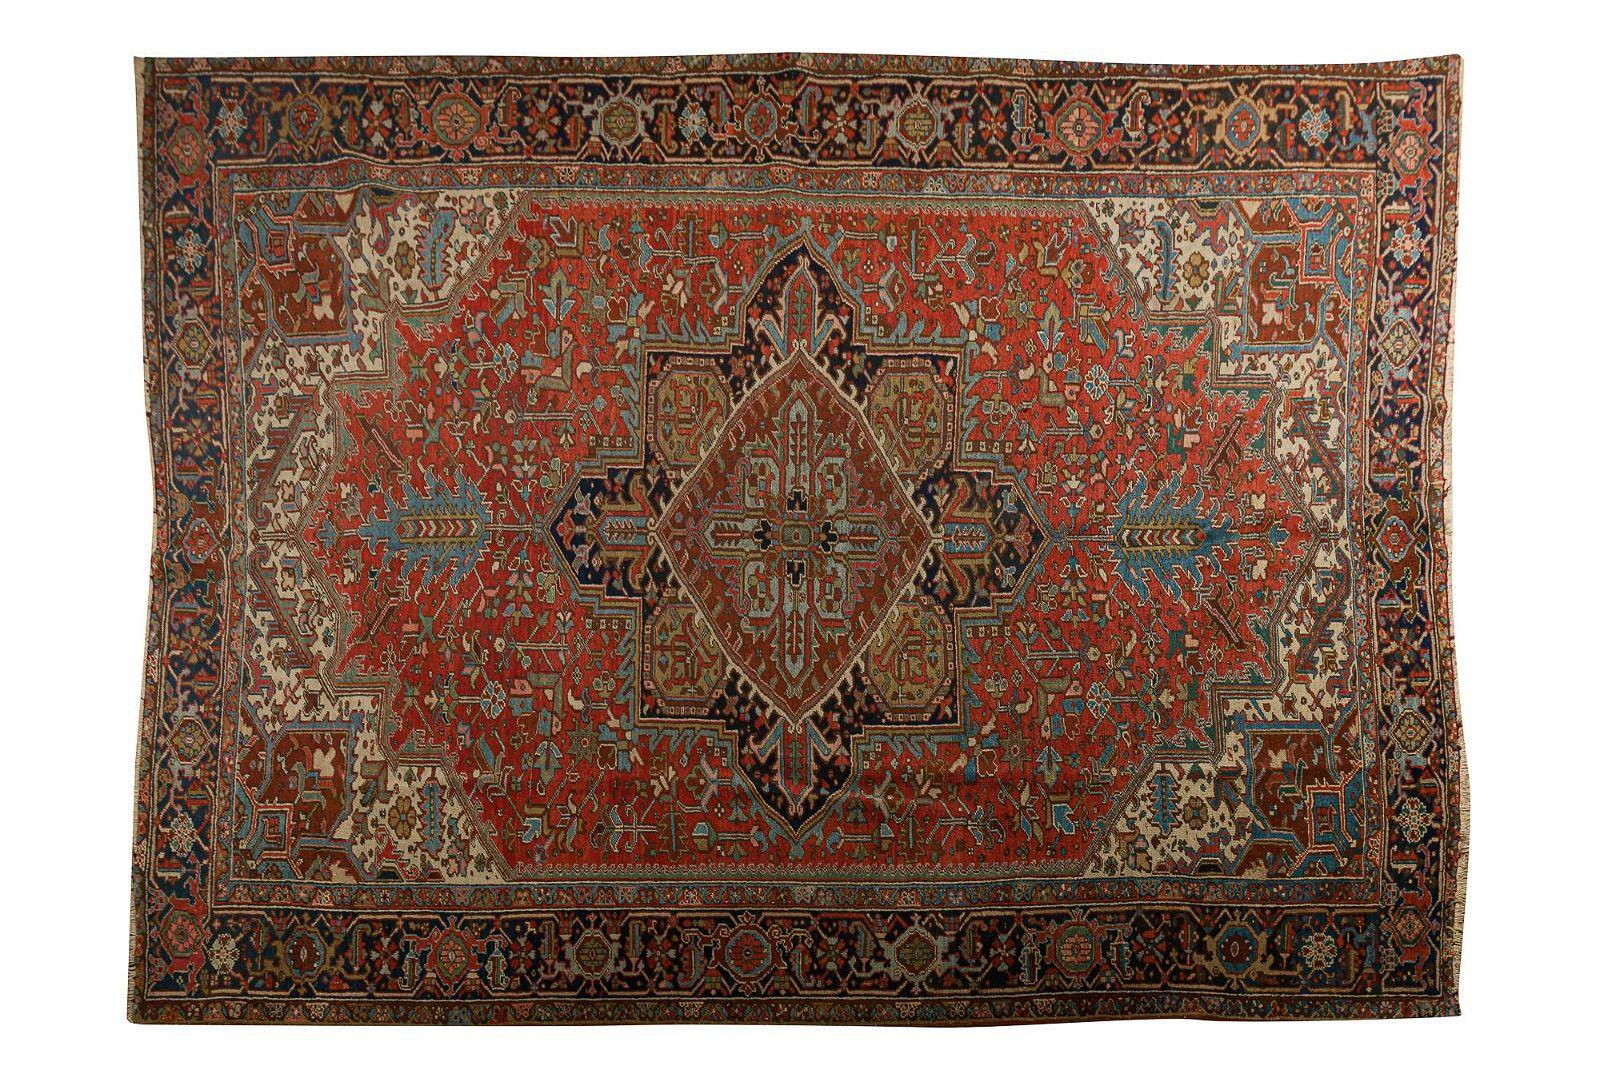 Persian heriz vintage carpet, early 20th century